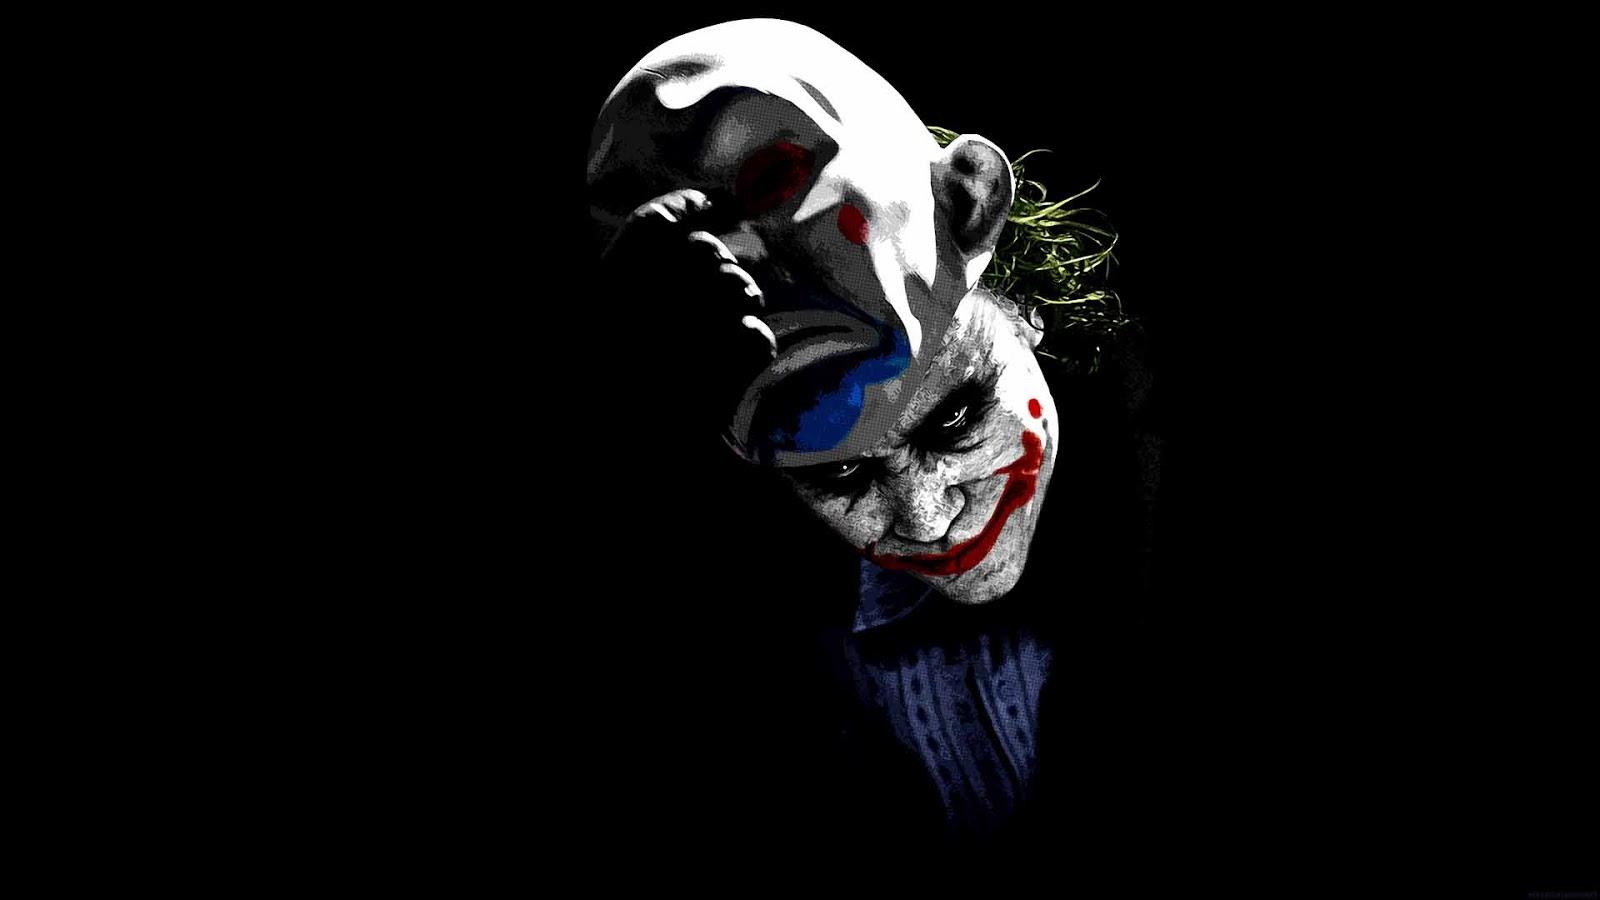 trololo blogg Wallpaper Joker Hd 1600x900